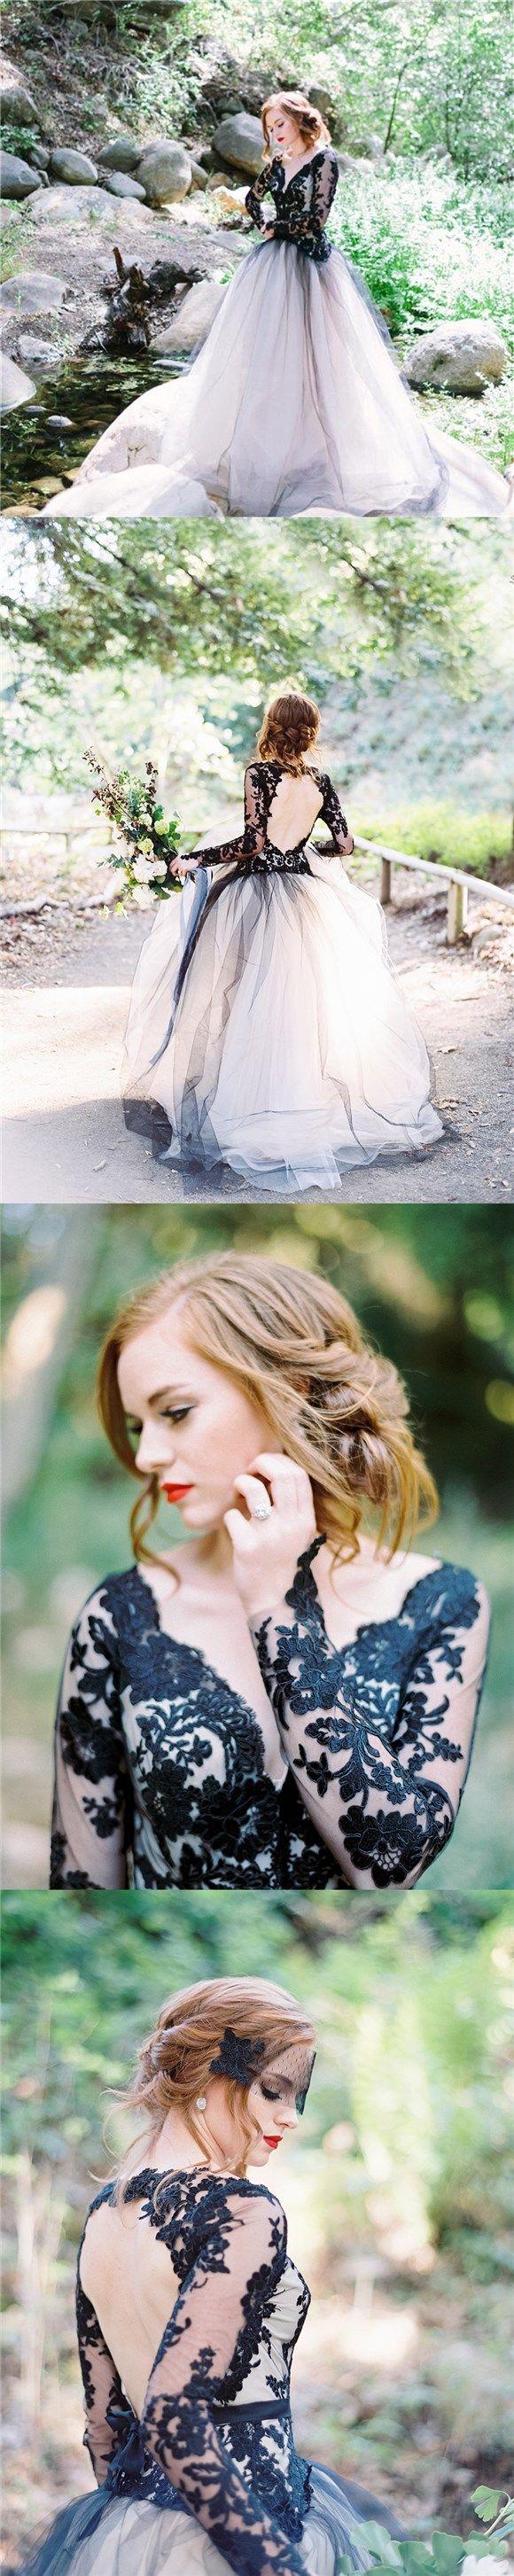 Charming Black Lace Newest Elegant Fashion Prom Dress, Custom Long Sleeves Open Back Wedding Dress, PD0393